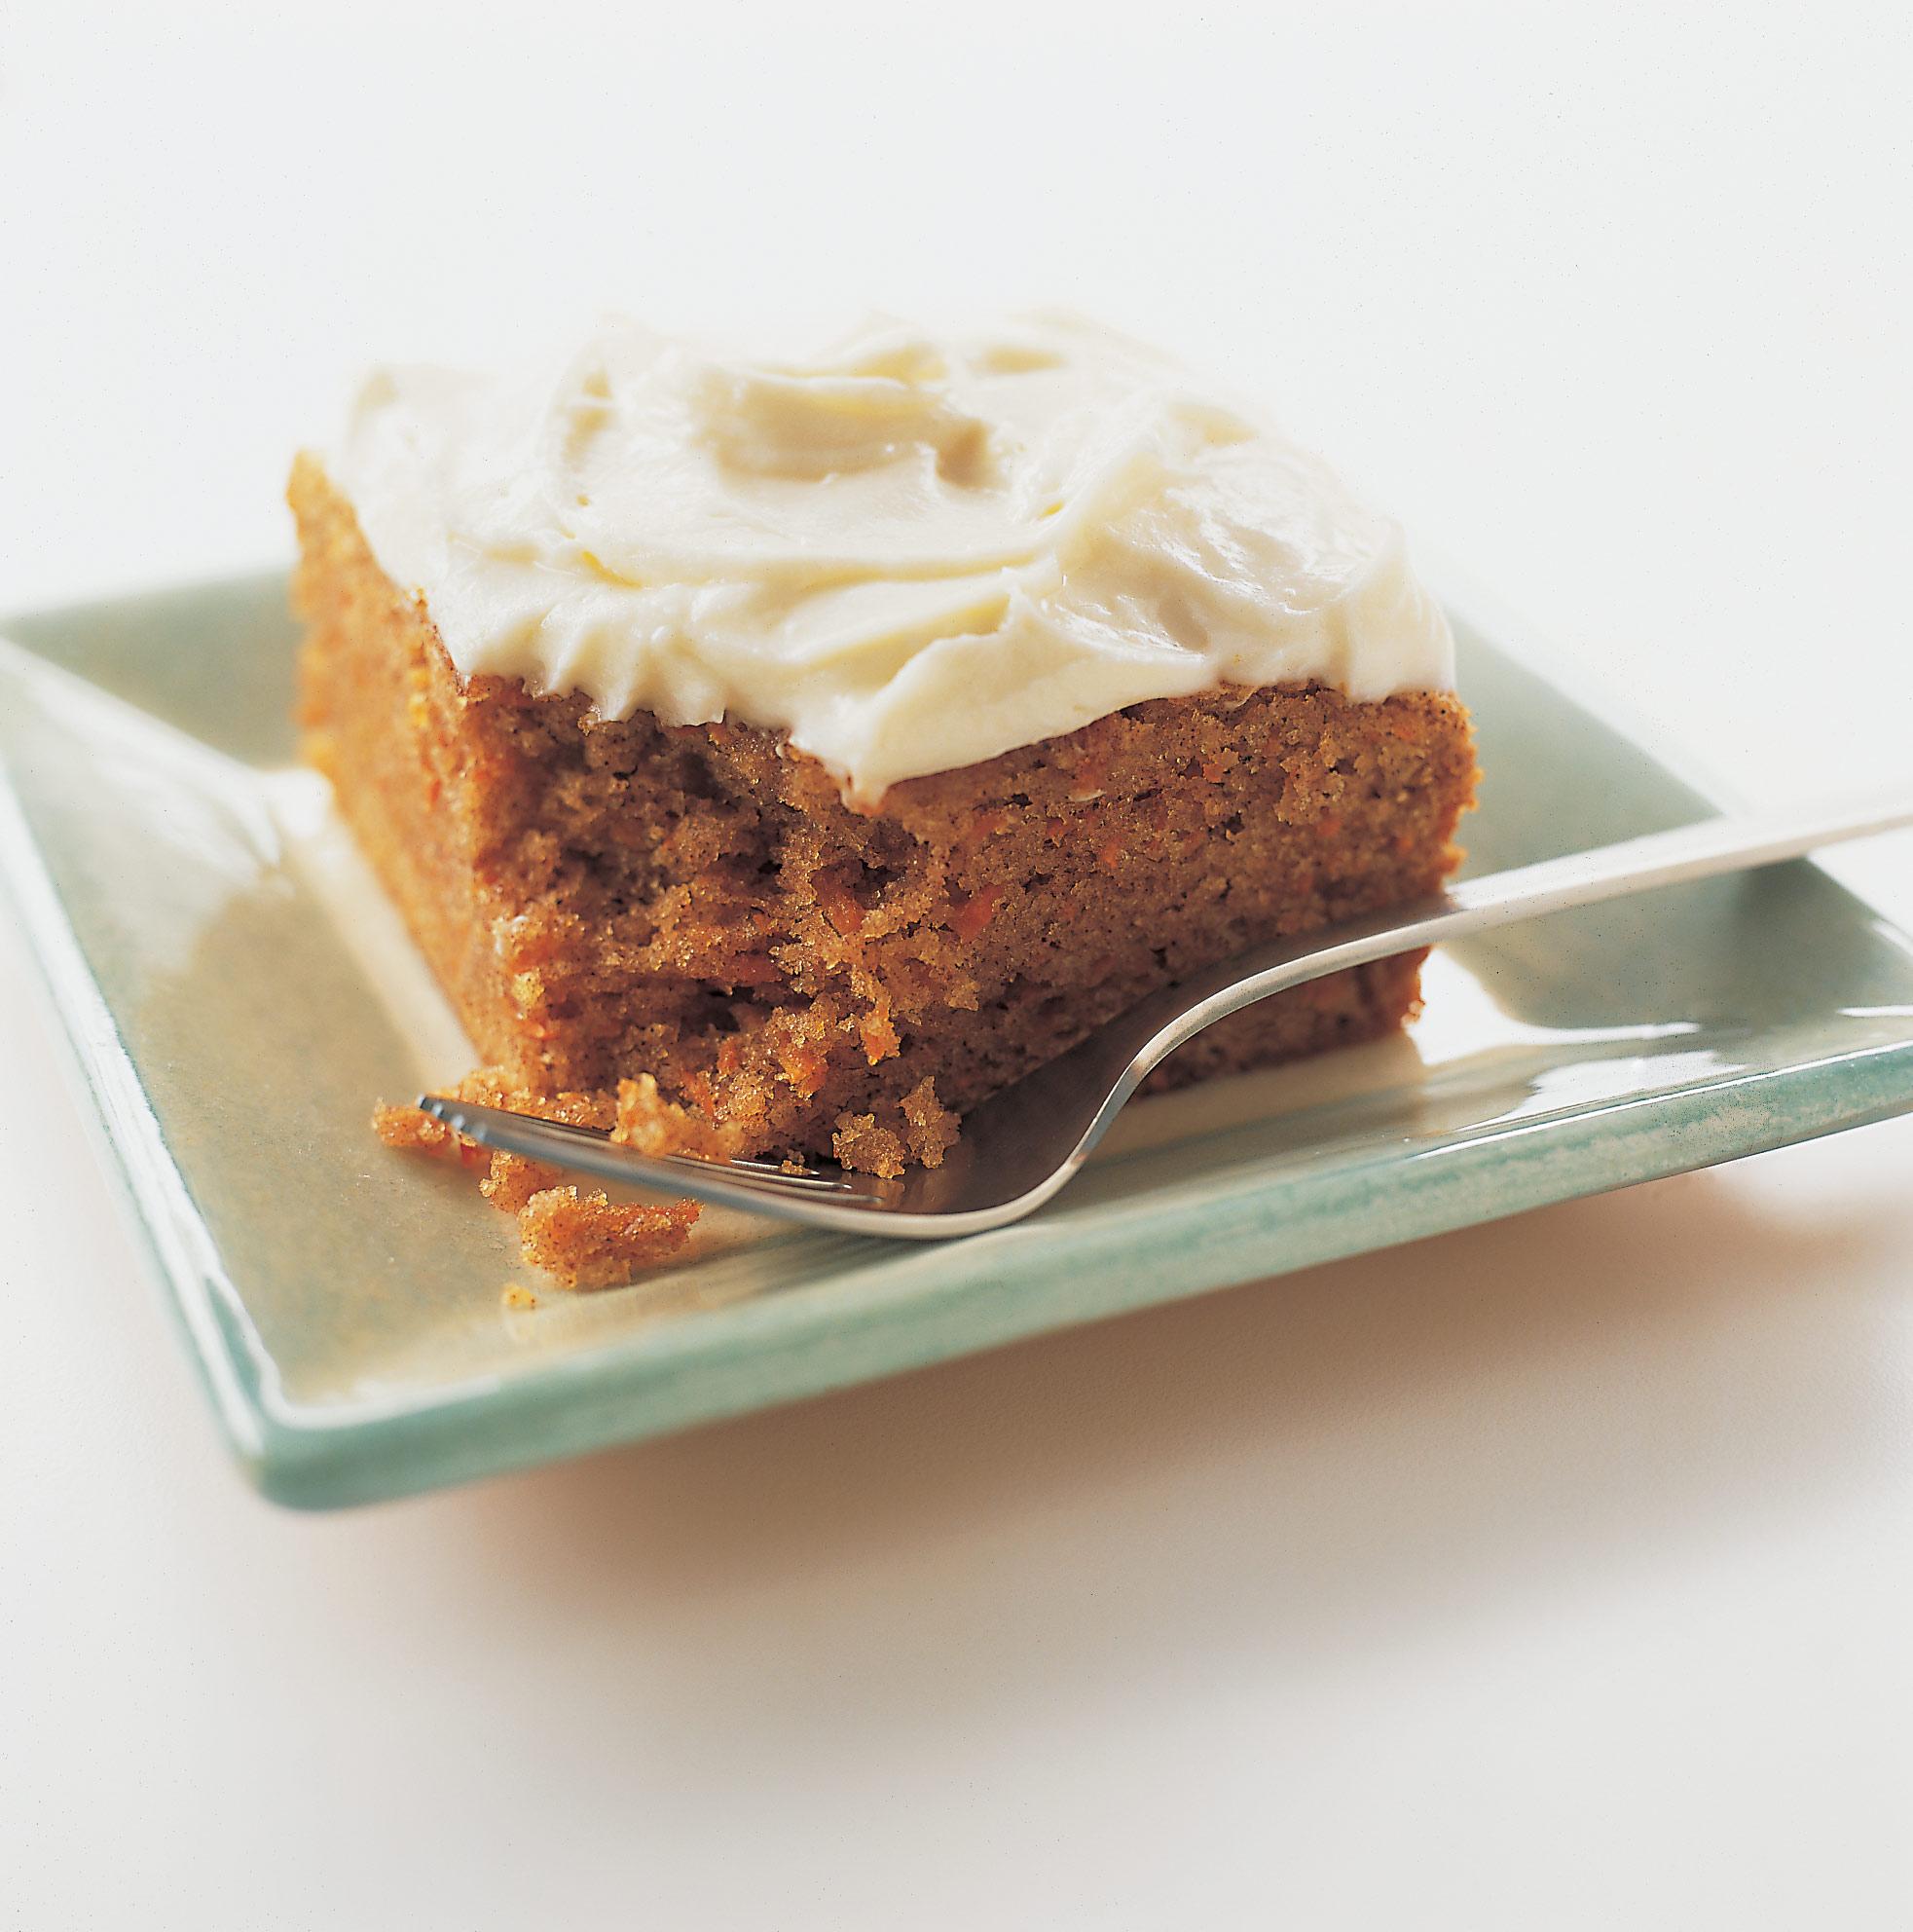 Americas Test Kitchen Gluten Free Carrot Cake